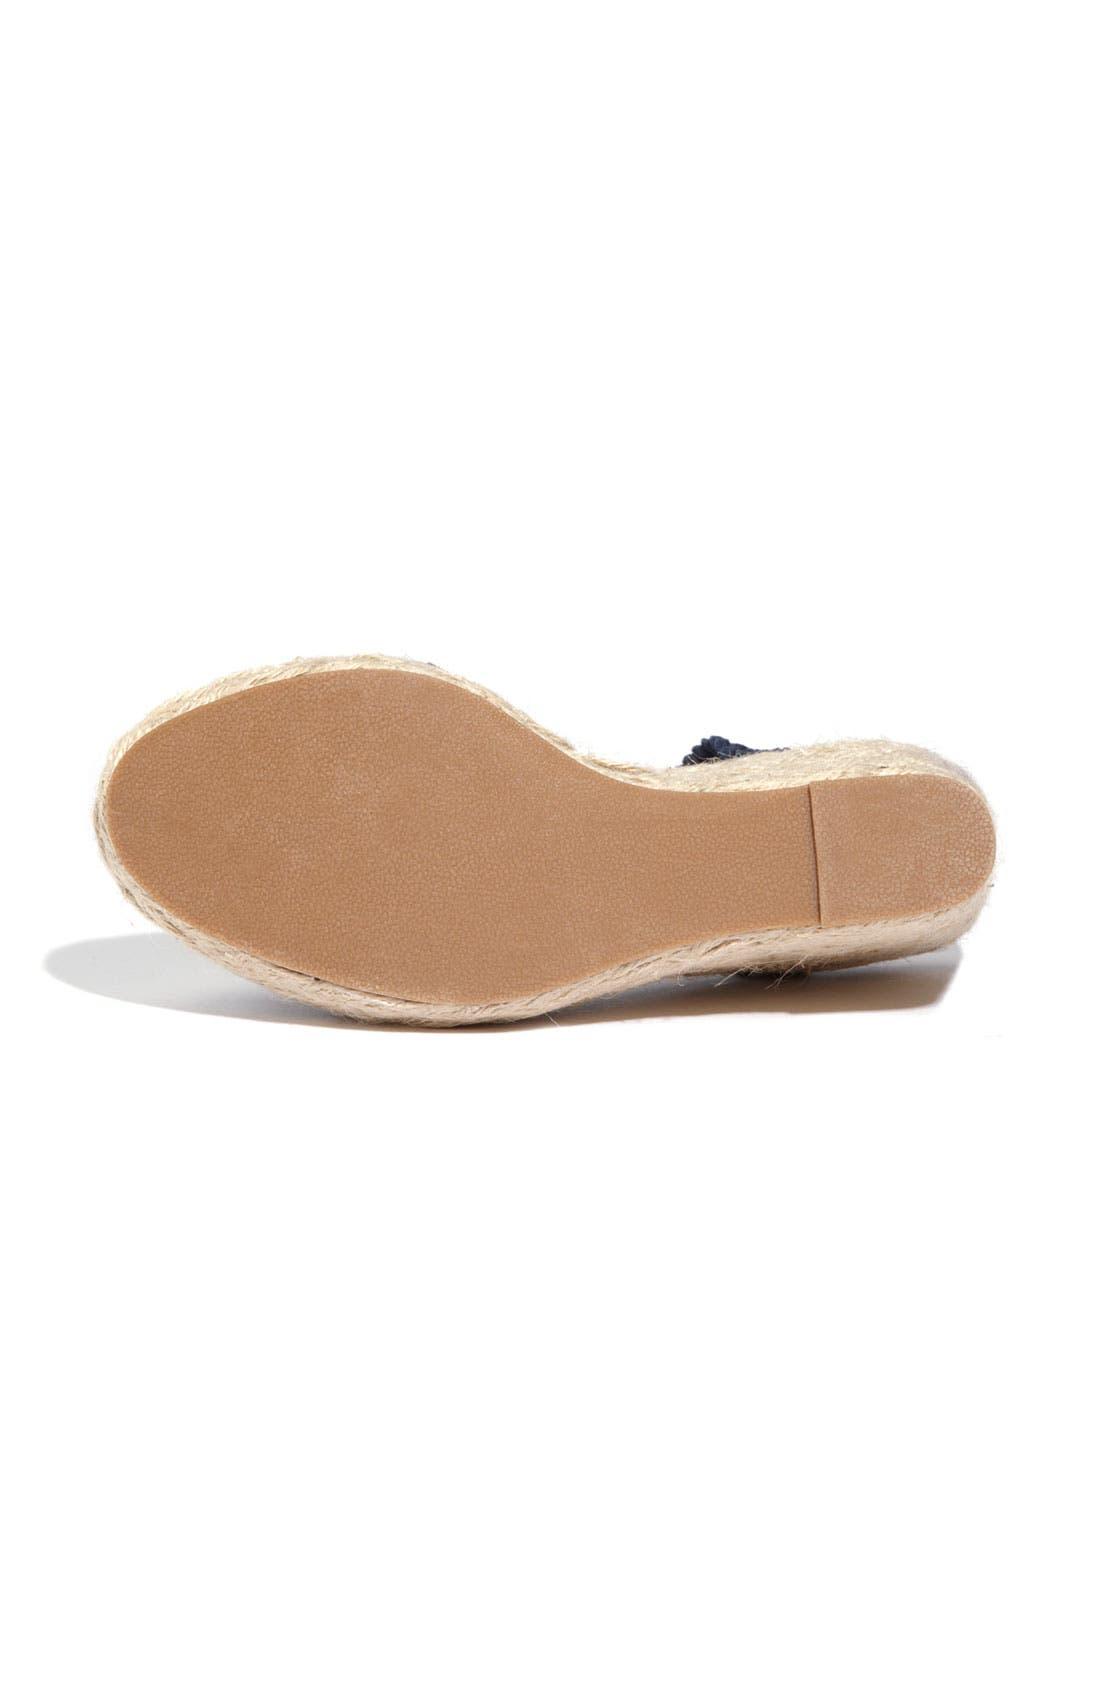 'Manngo' Woven Sandal,                             Alternate thumbnail 7, color,